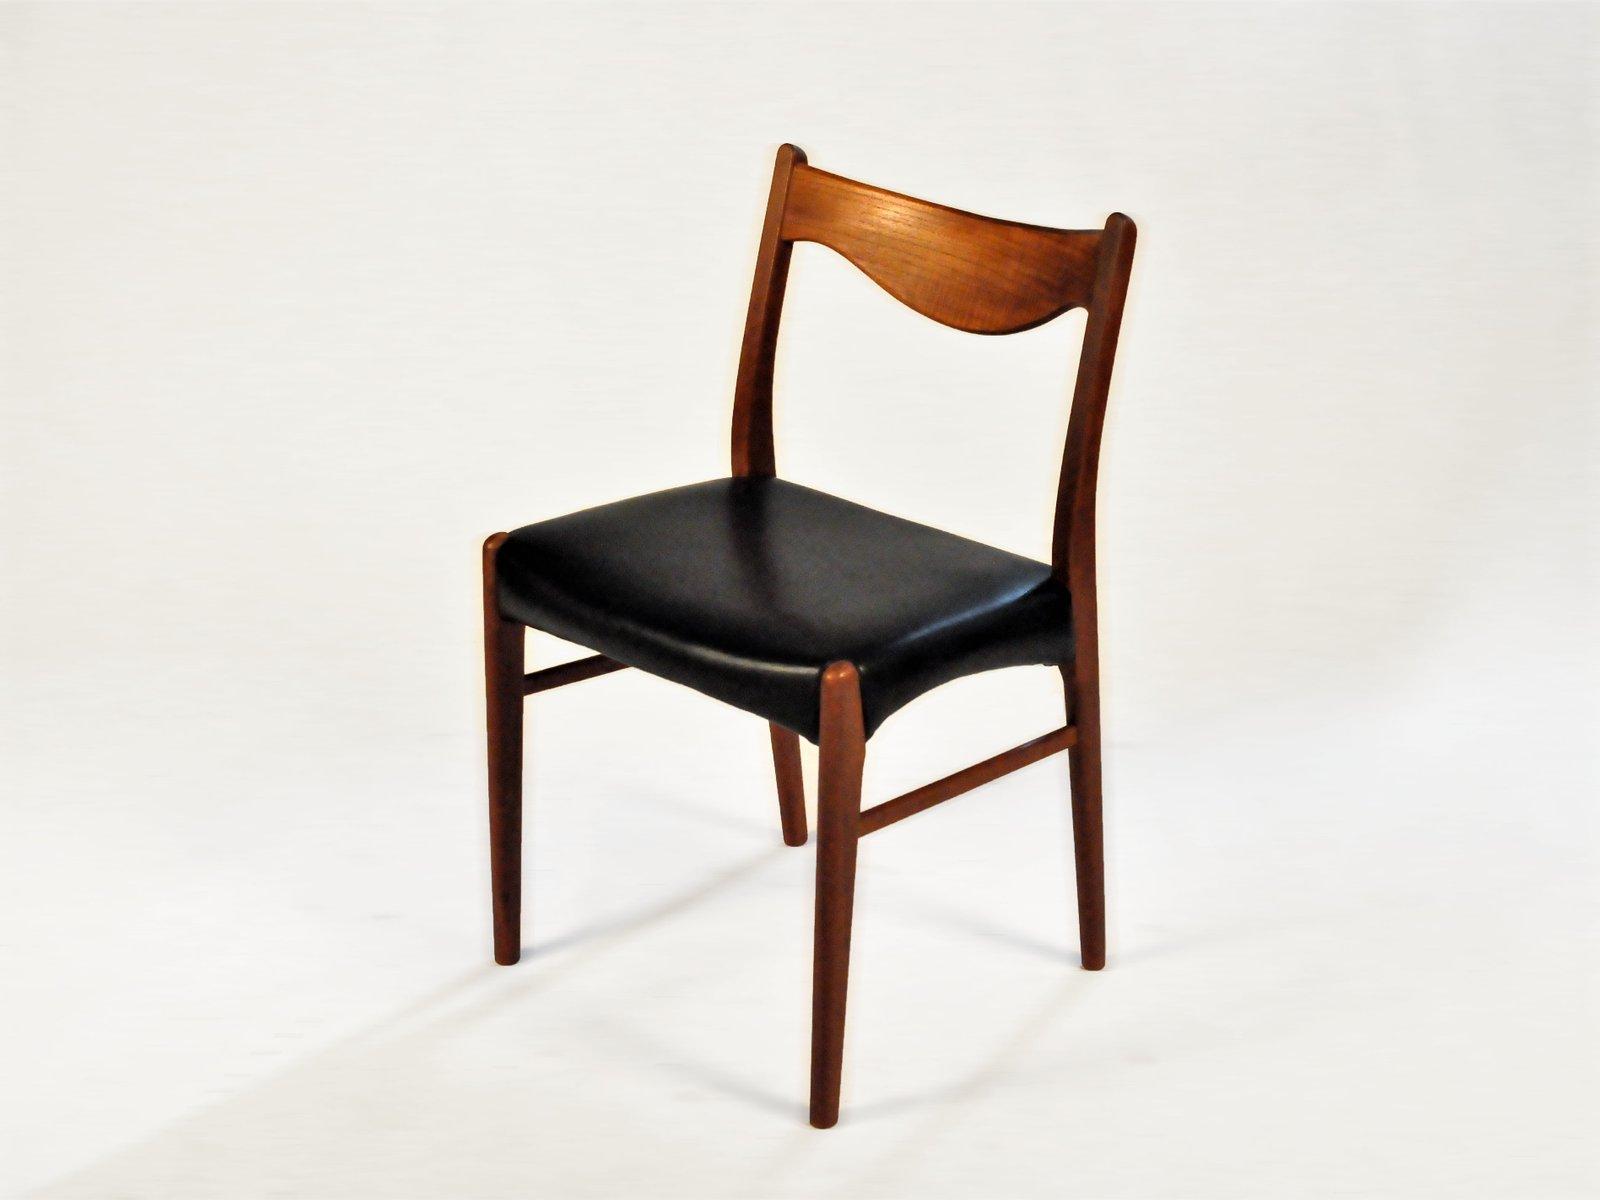 Teak Dining Chairs By Ejnar Larsen U0026 Axel Bender Madsen For Glyngøre  Stolefabrik, 1960s, Set Of 2